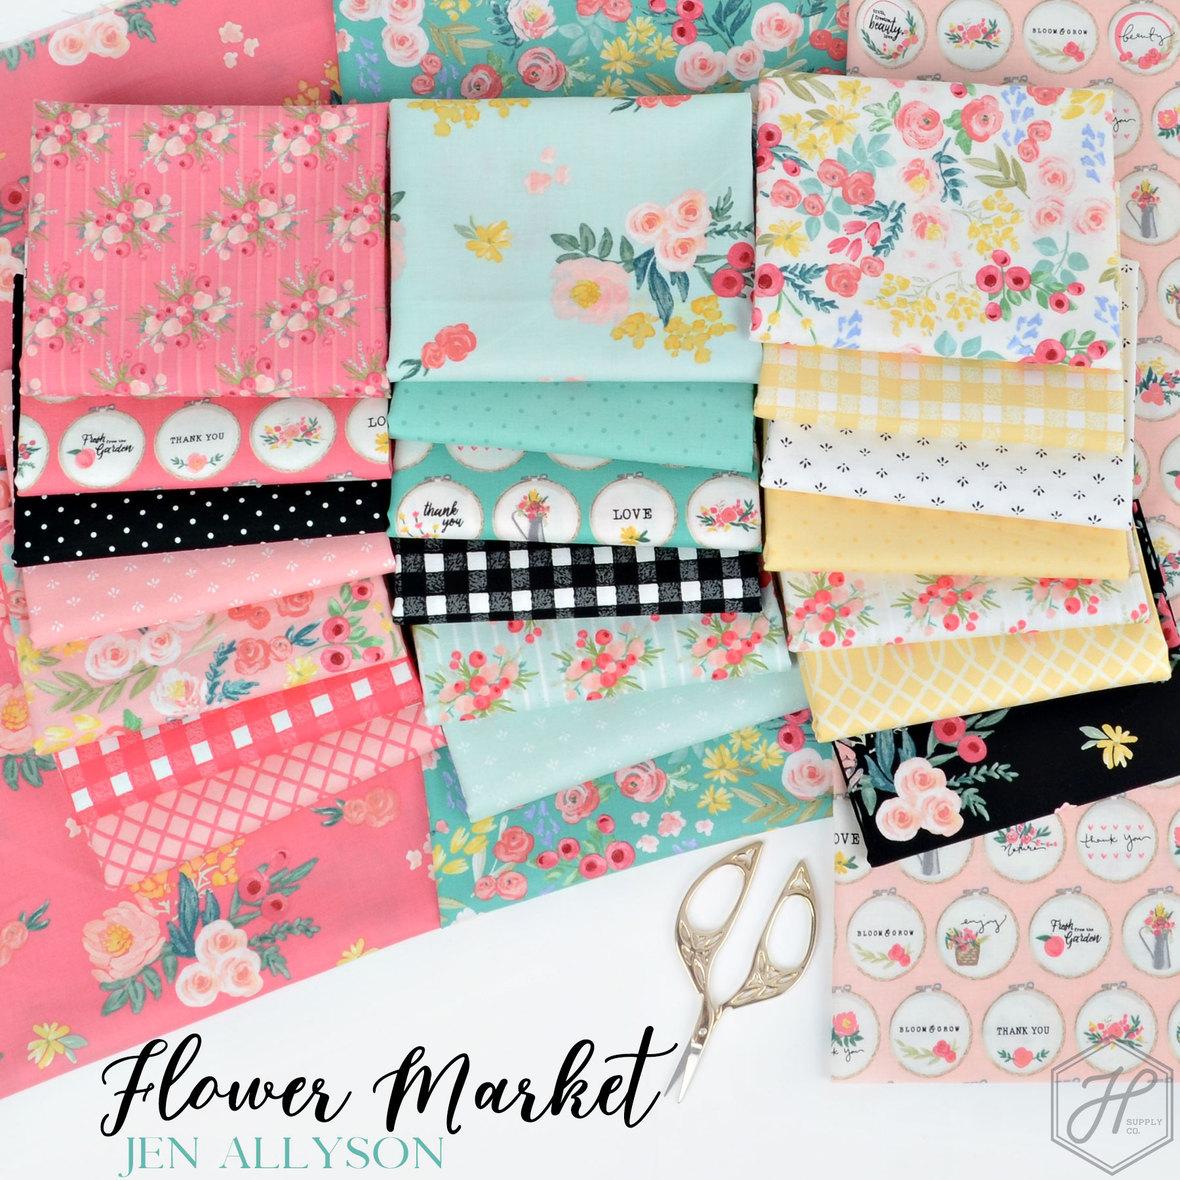 Flower-Market-Riley-Blake-Jen-Allyson-at-Hawthorne-Supply-Co